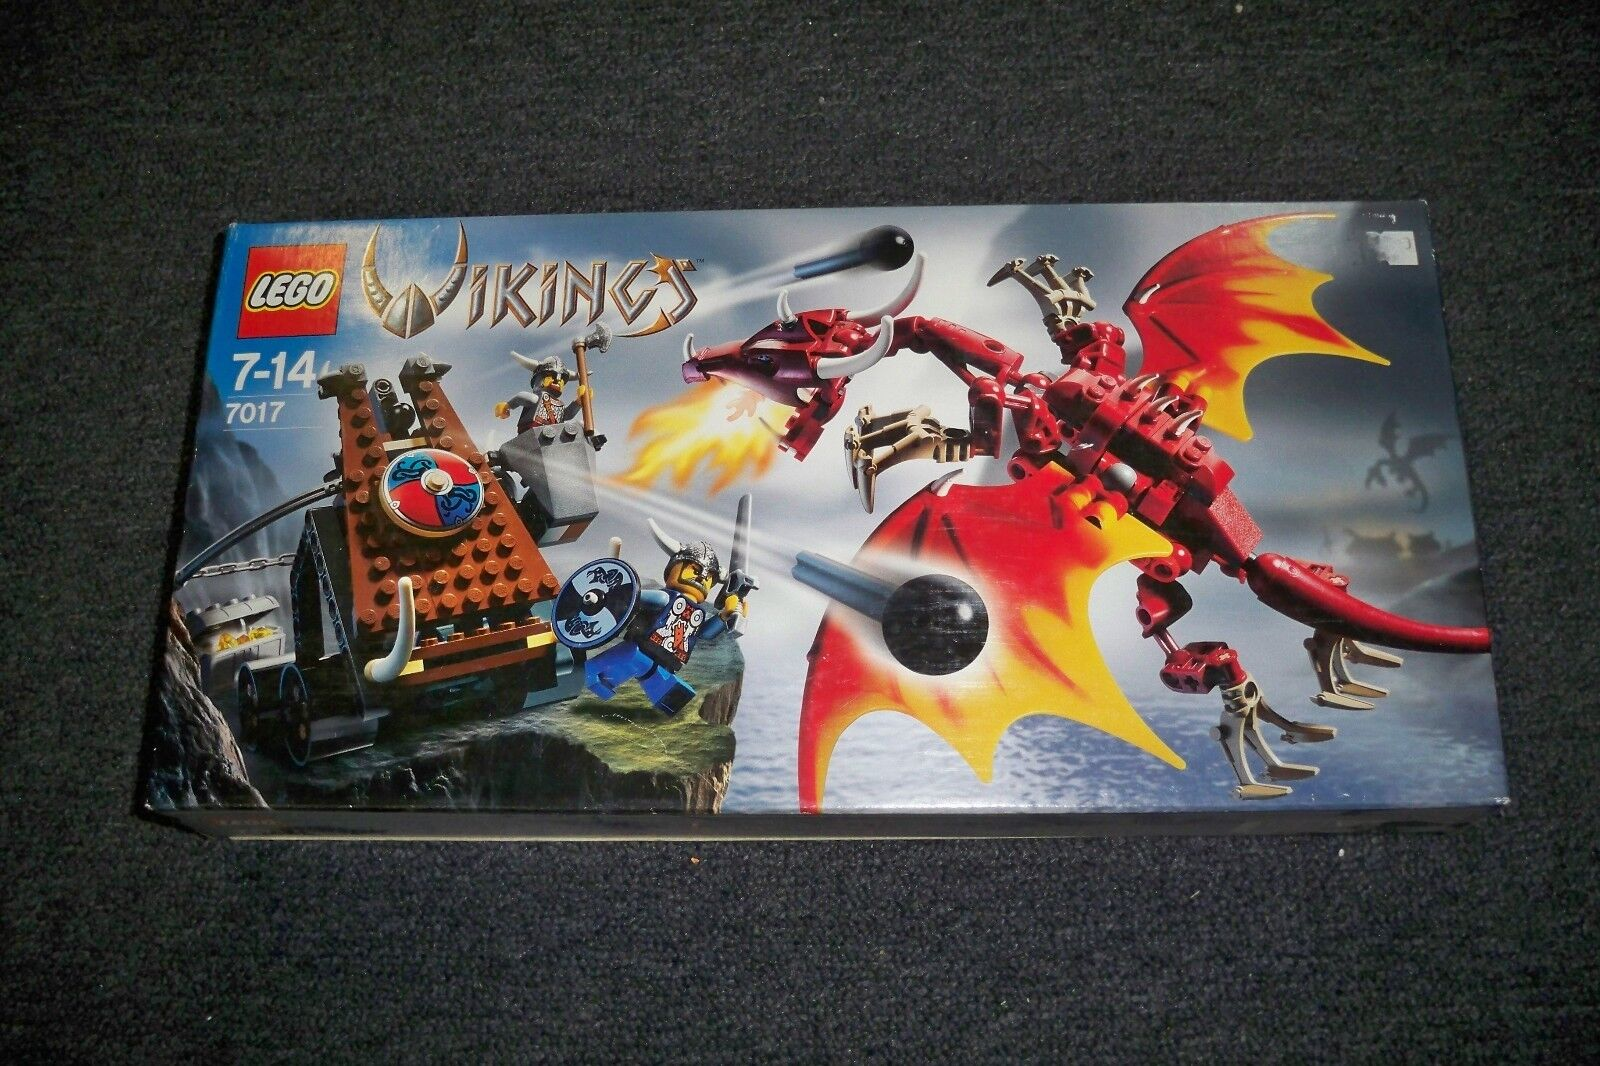 Lego Wikinger, 7017, Katapult und Drache